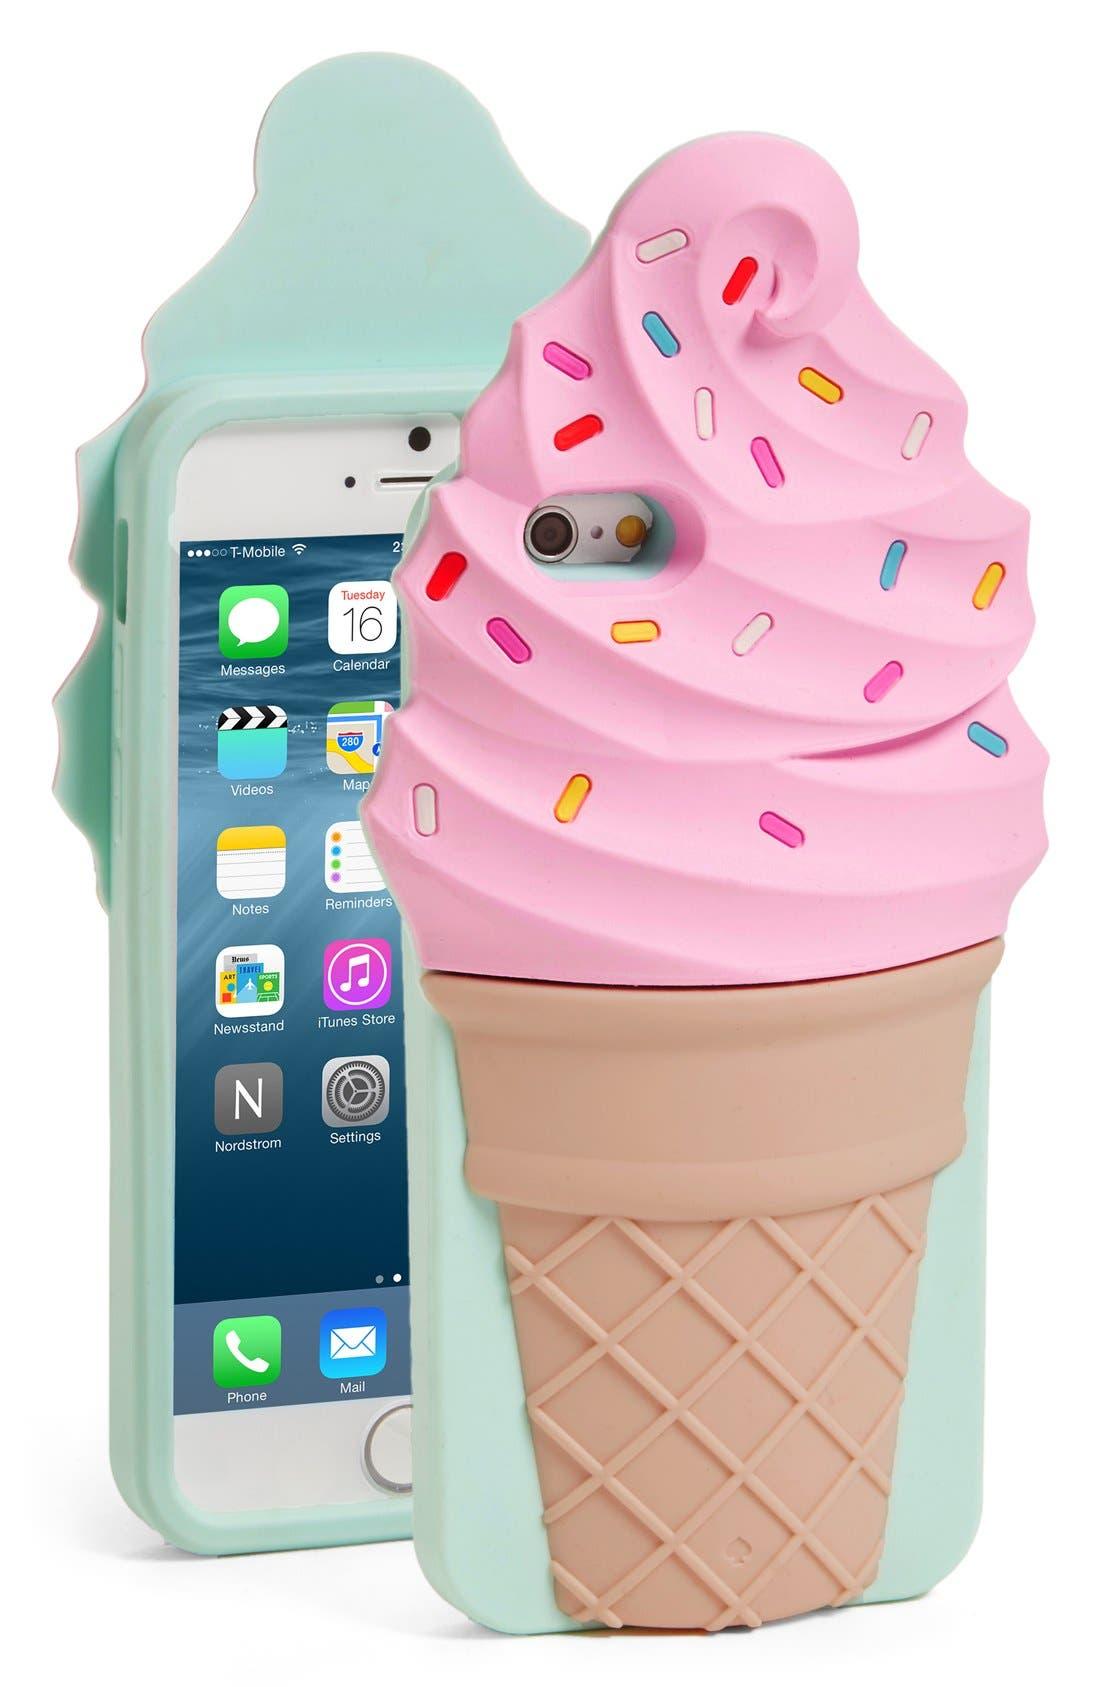 Main Image - kate spade new york 'ice cream' iPhone 6 & 6s case